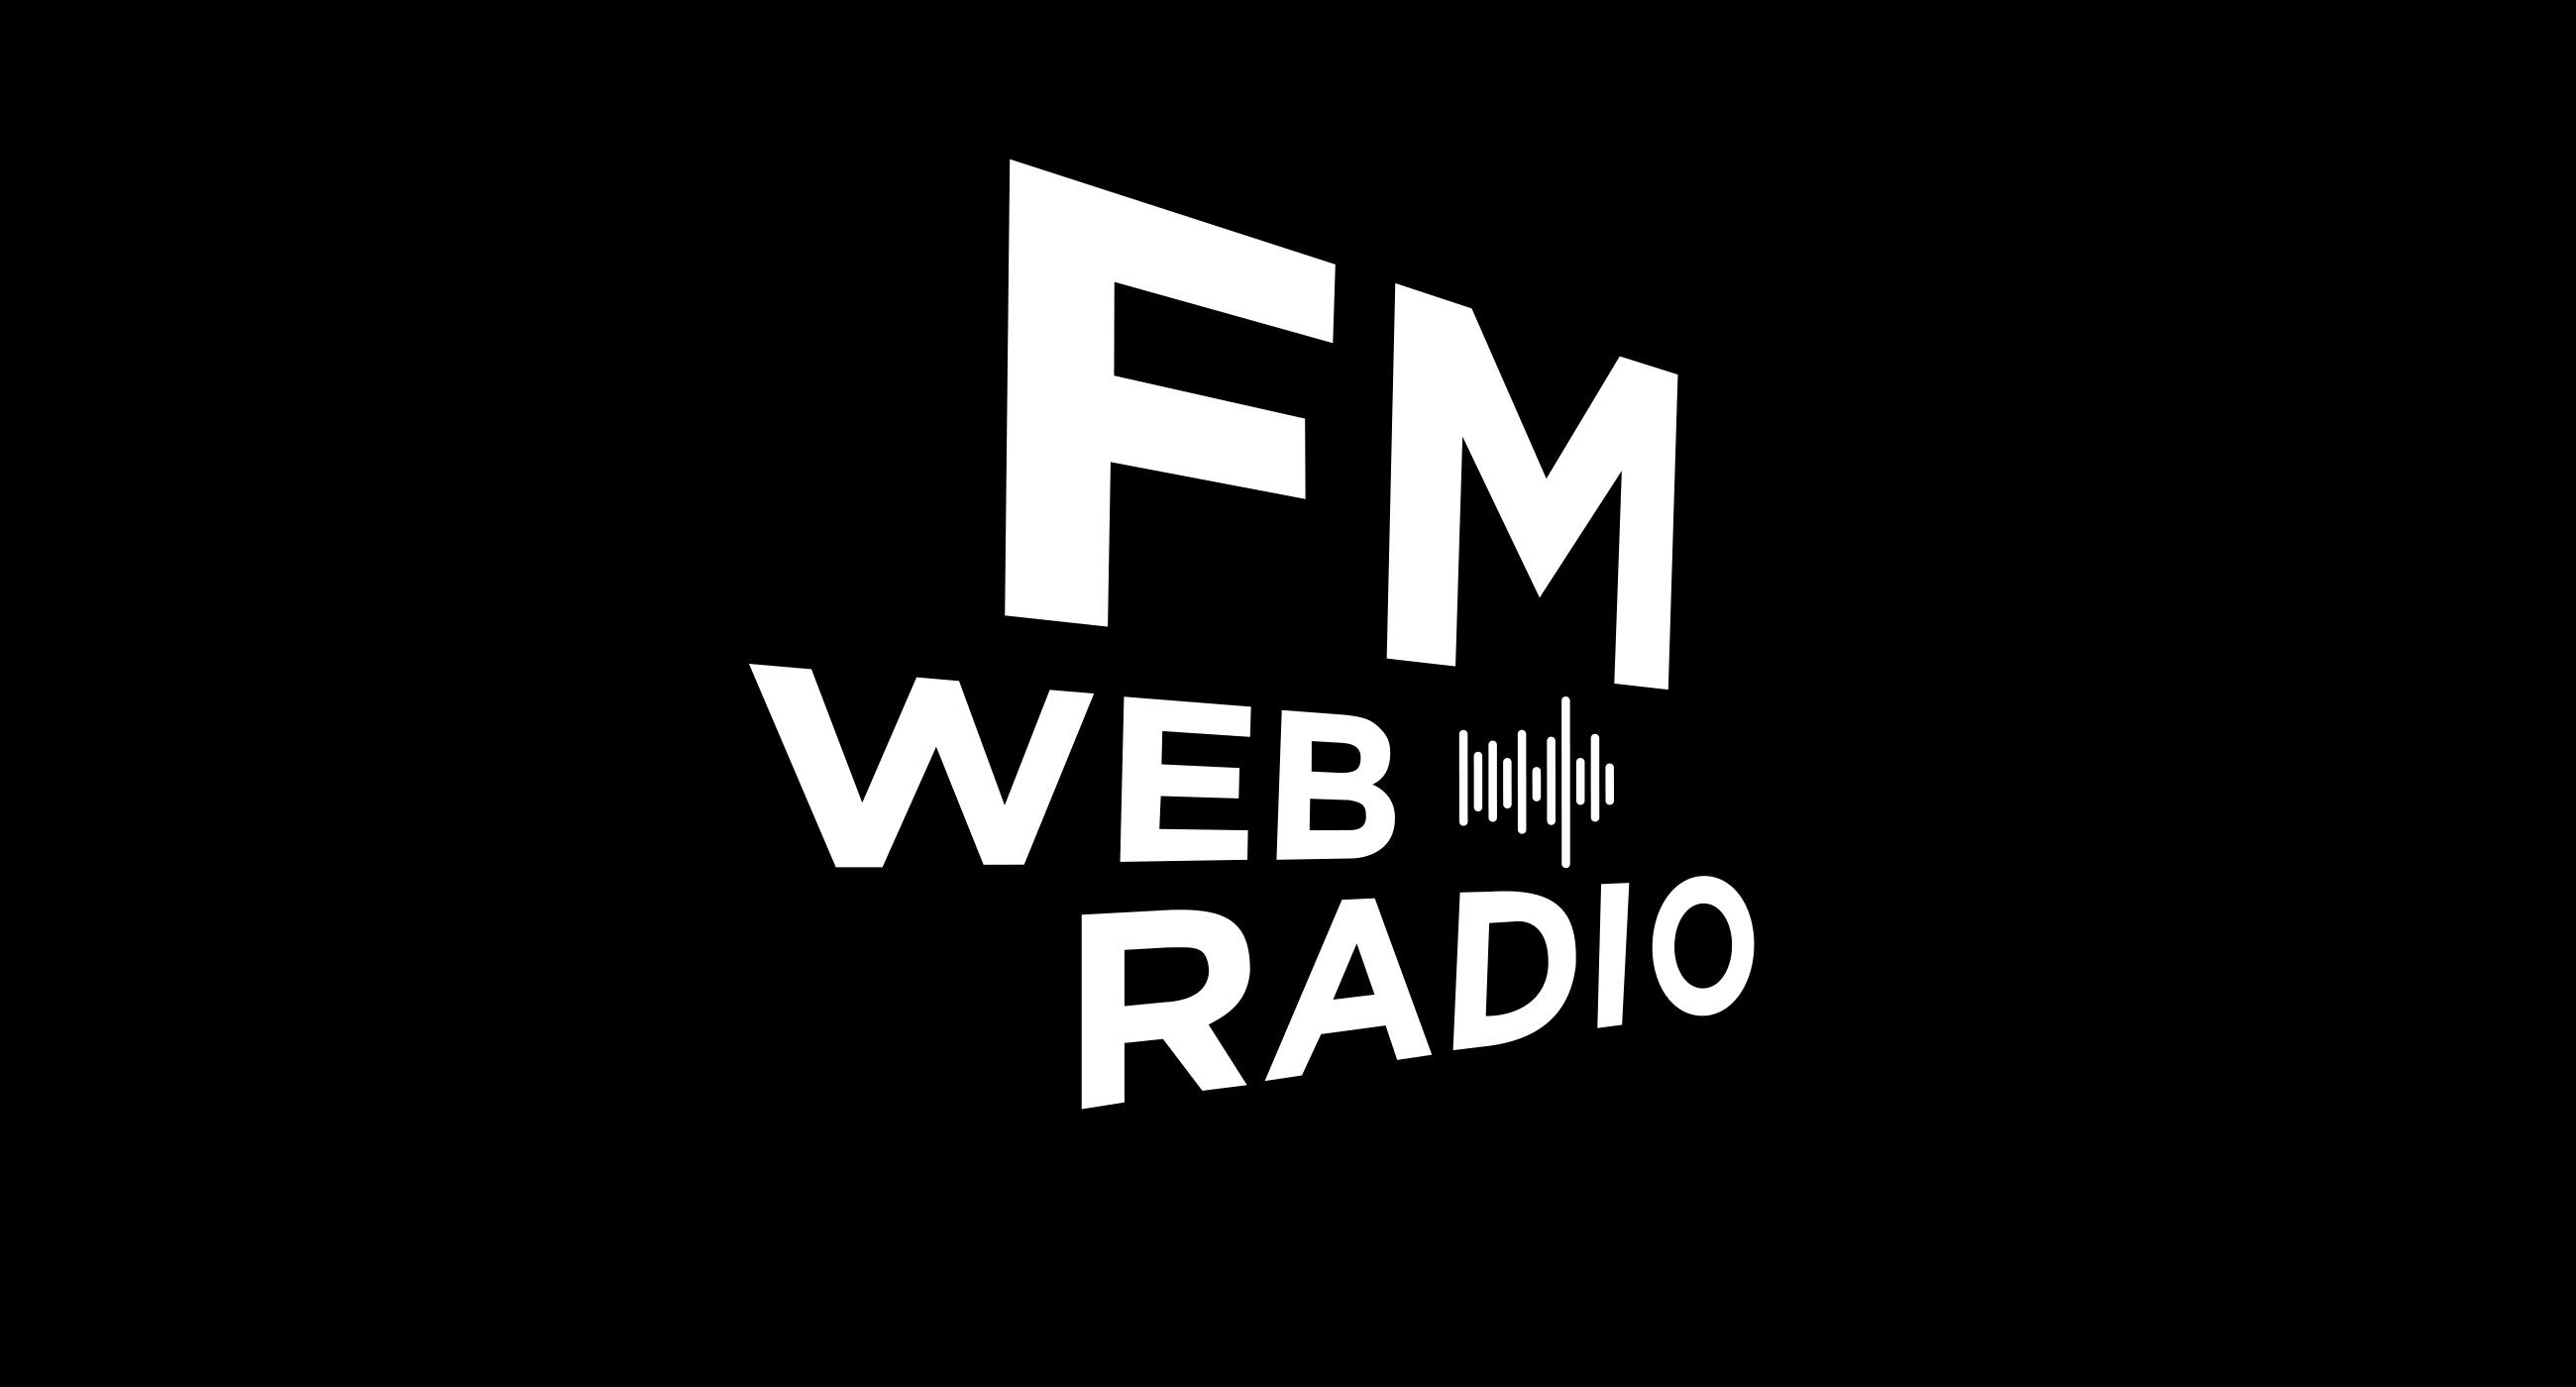 FM Web Radio